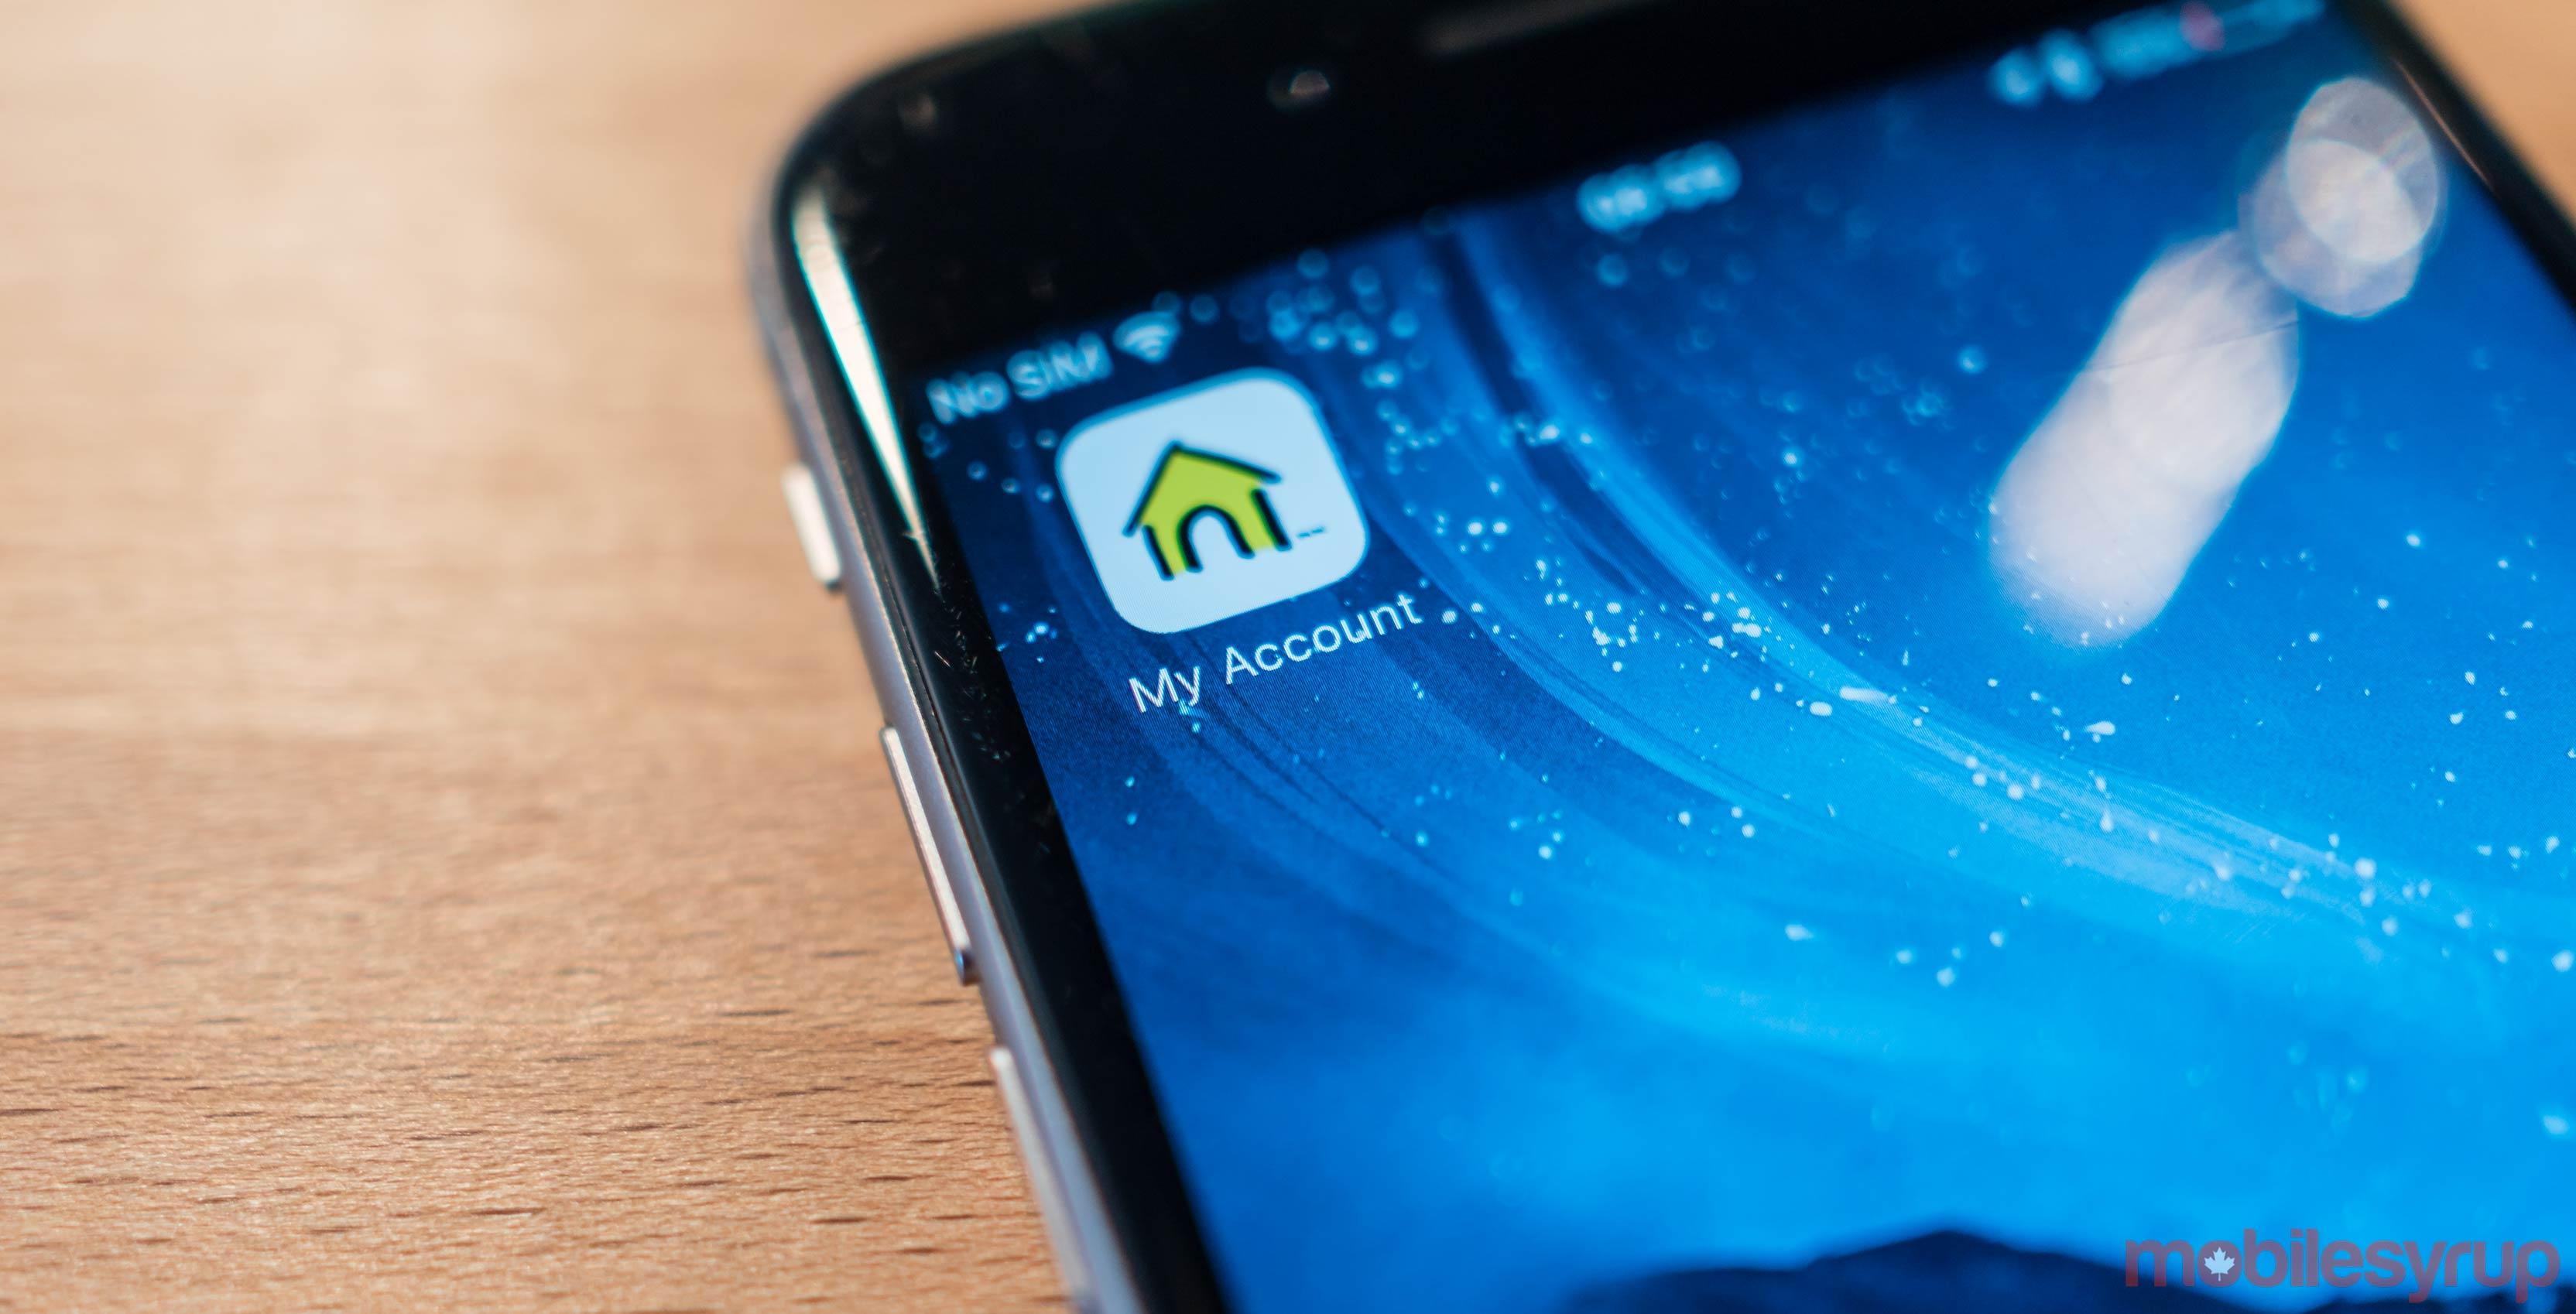 Fido My Account iPhone app